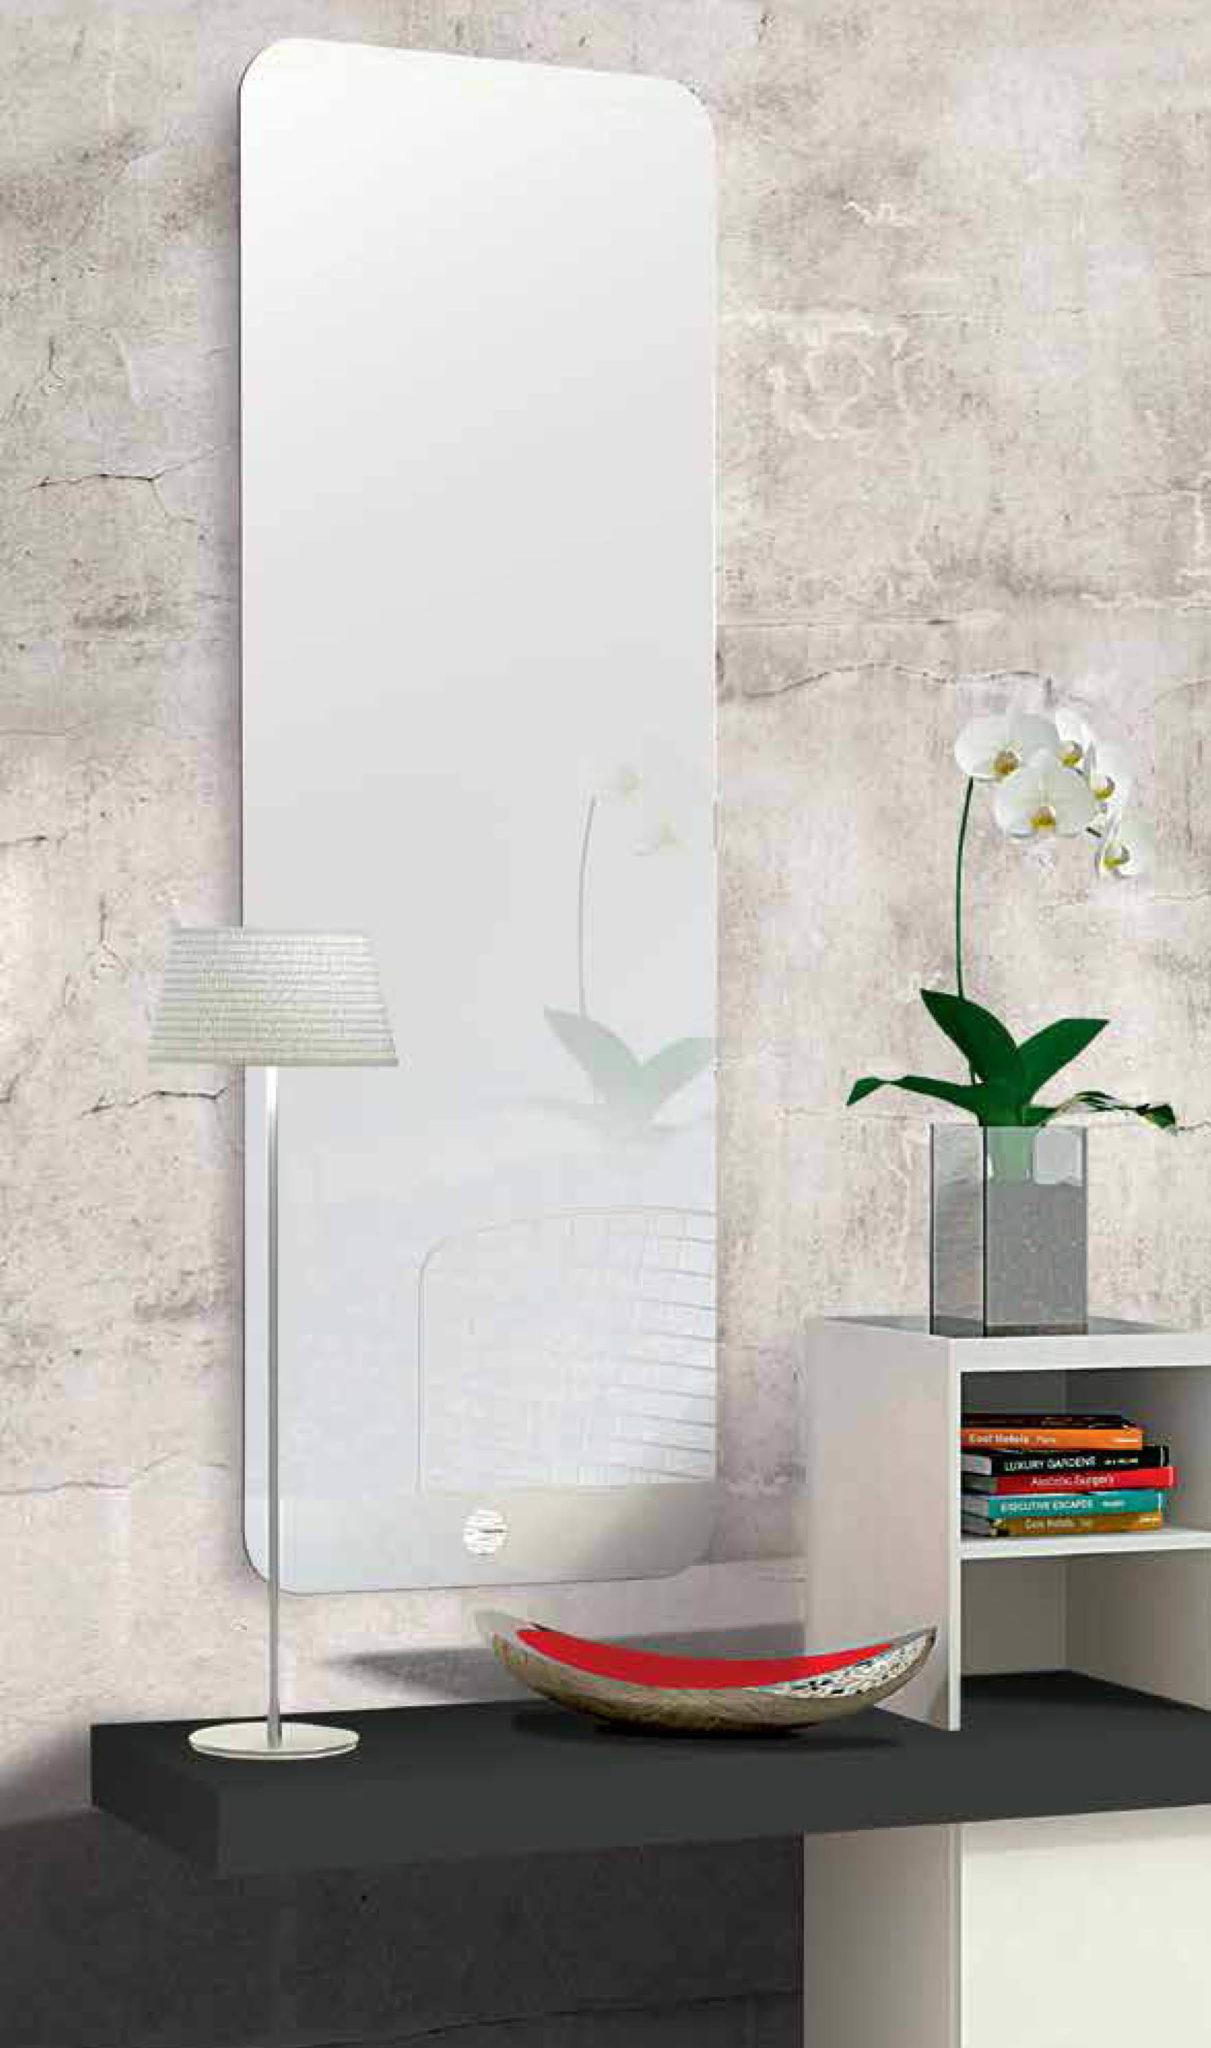 Espejo rectangular pelayo de cristal para viviendas - Cristal de espejo ...